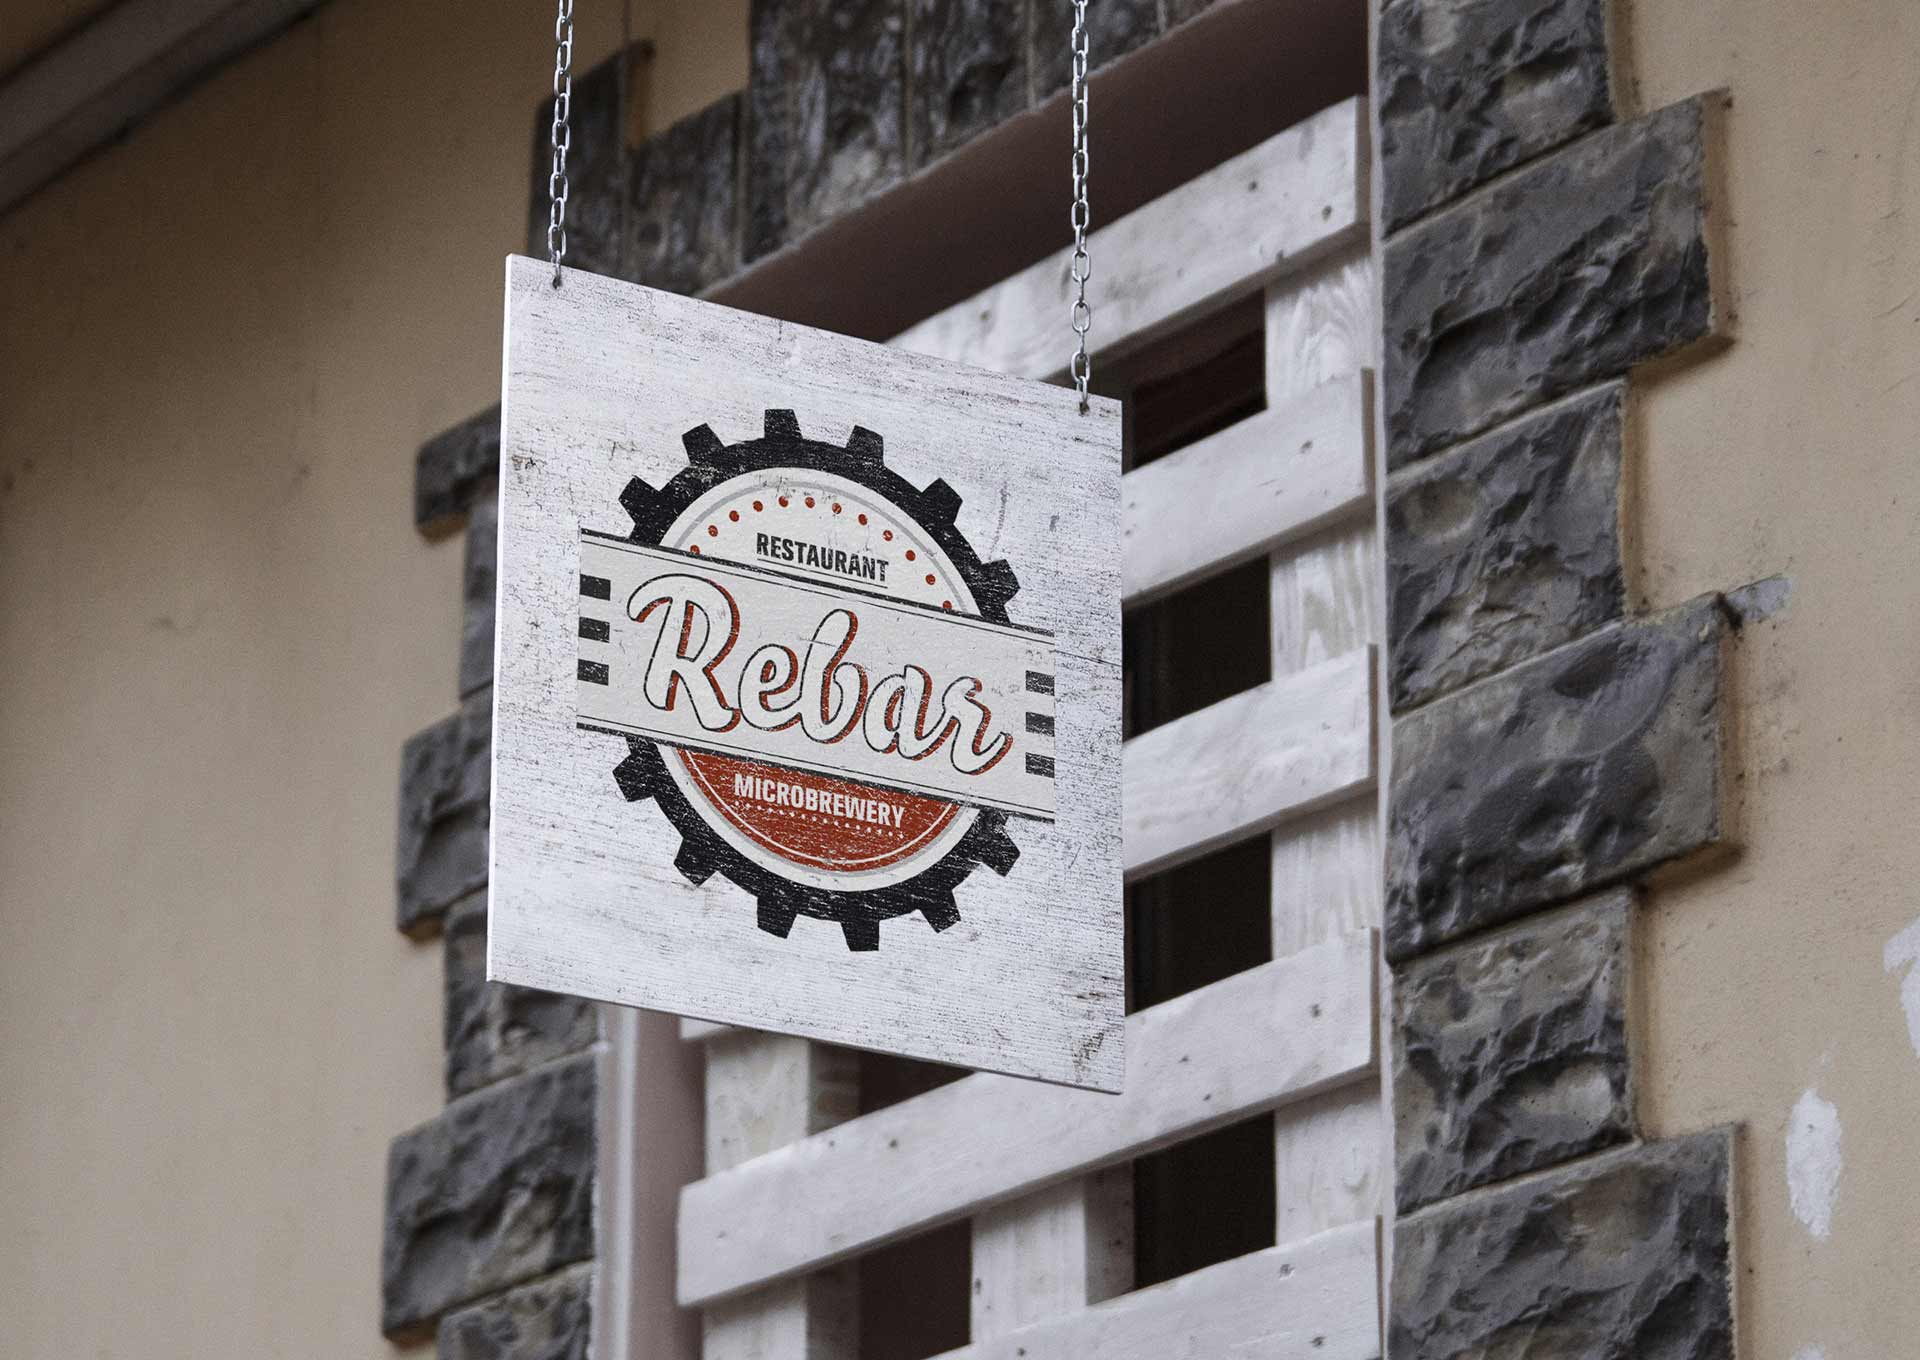 Rebar Restaurant & Microbrewey